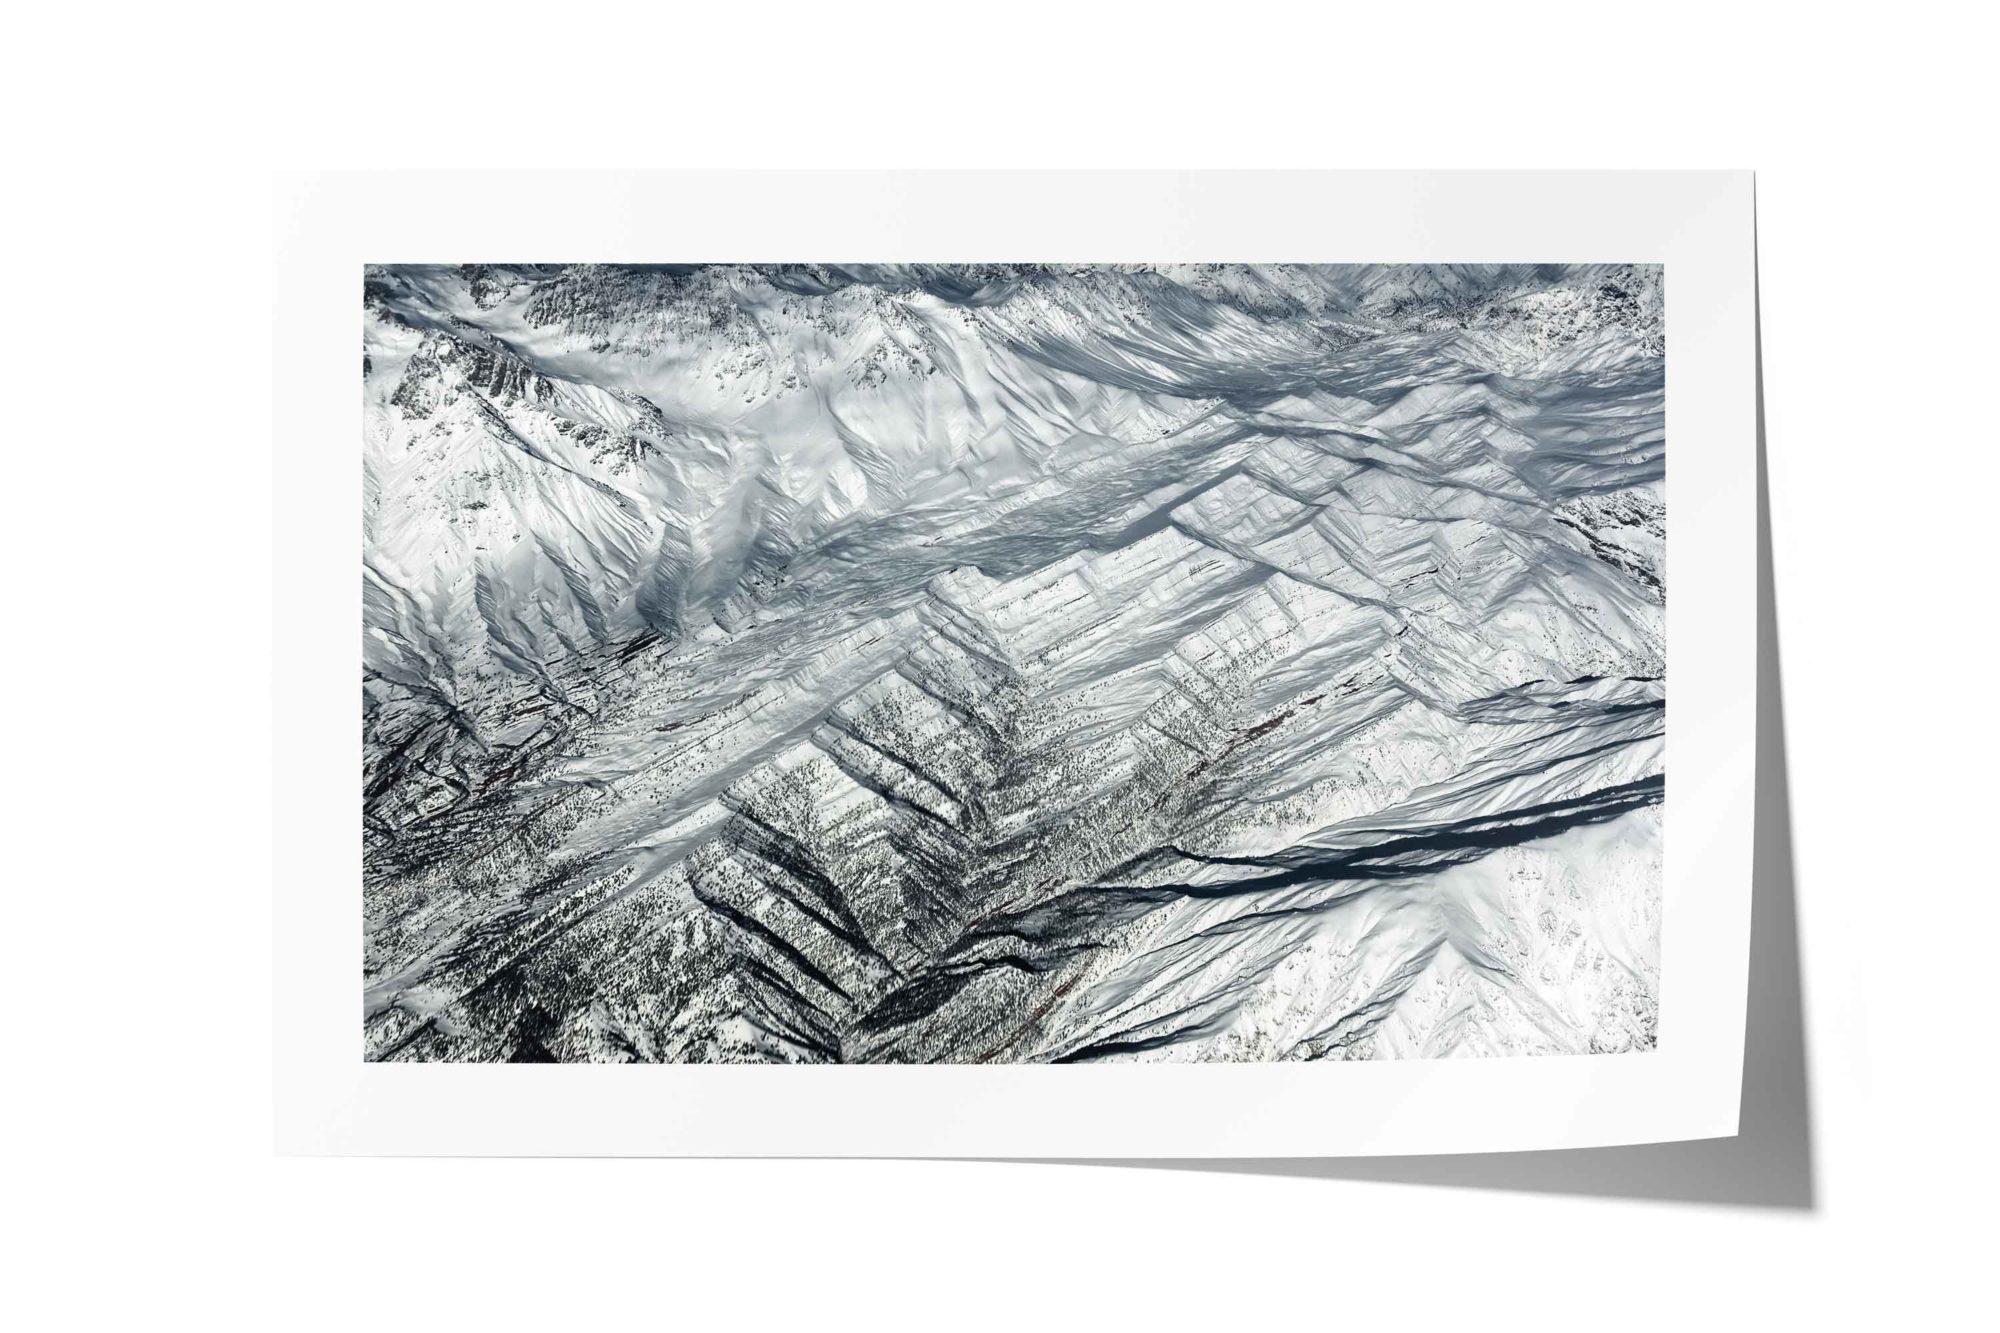 Zaravshan Mountain Range